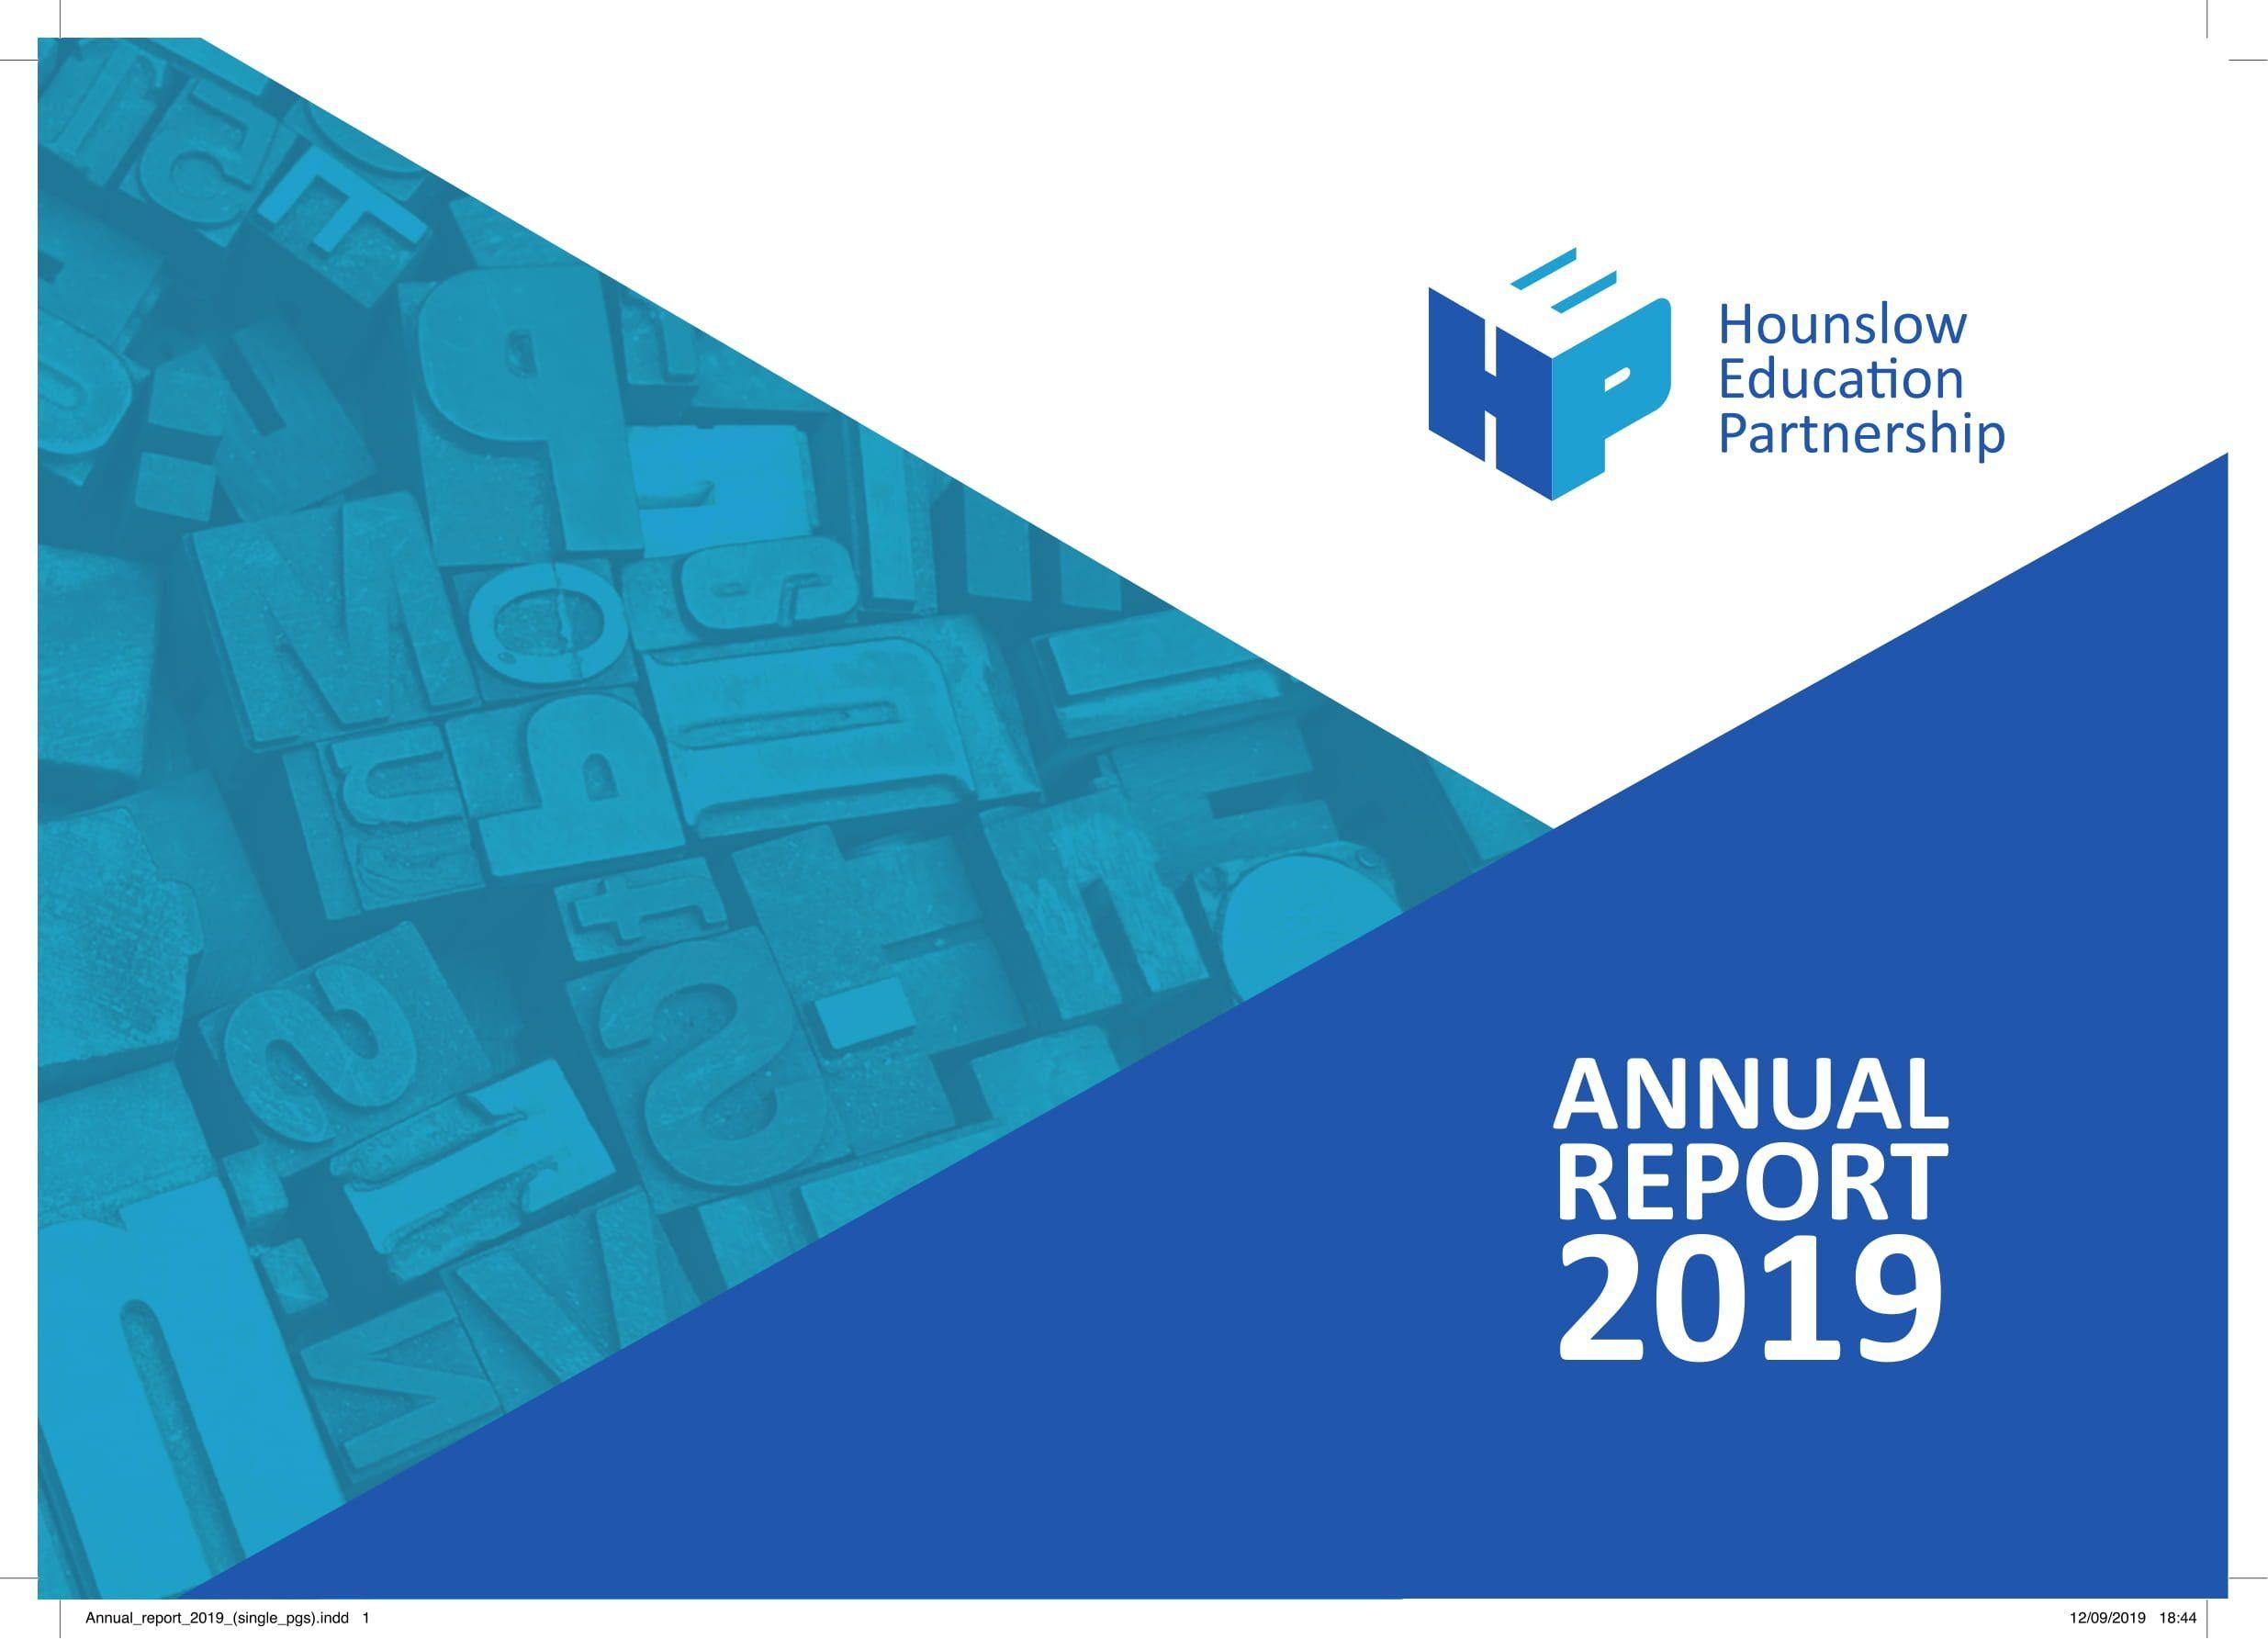 HEP Annual Report 2019